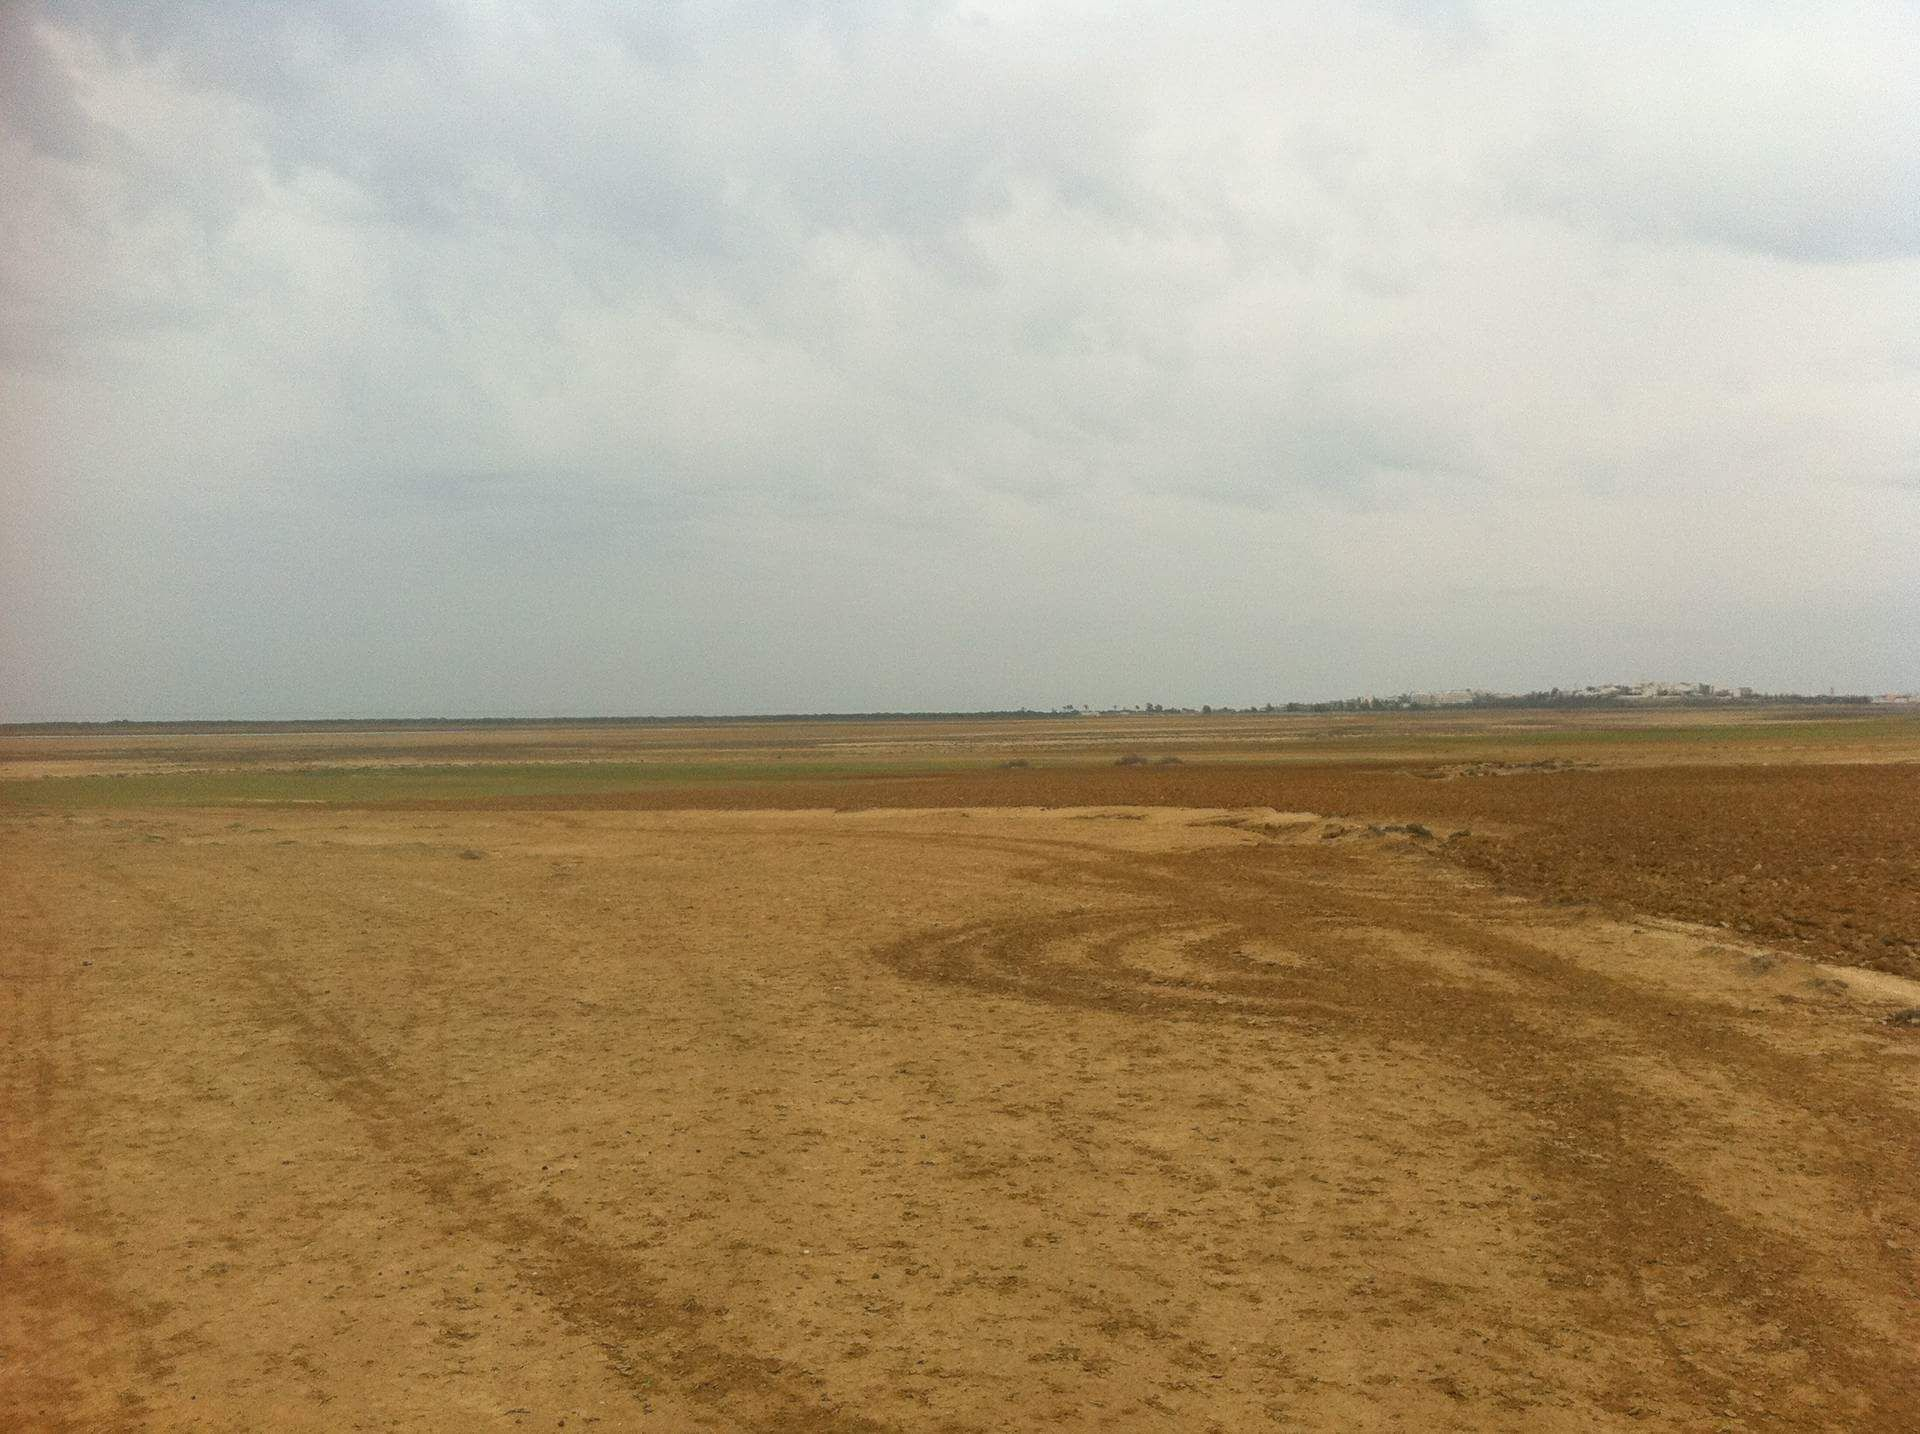 Image terrain vue de mer sousse tunisie 0